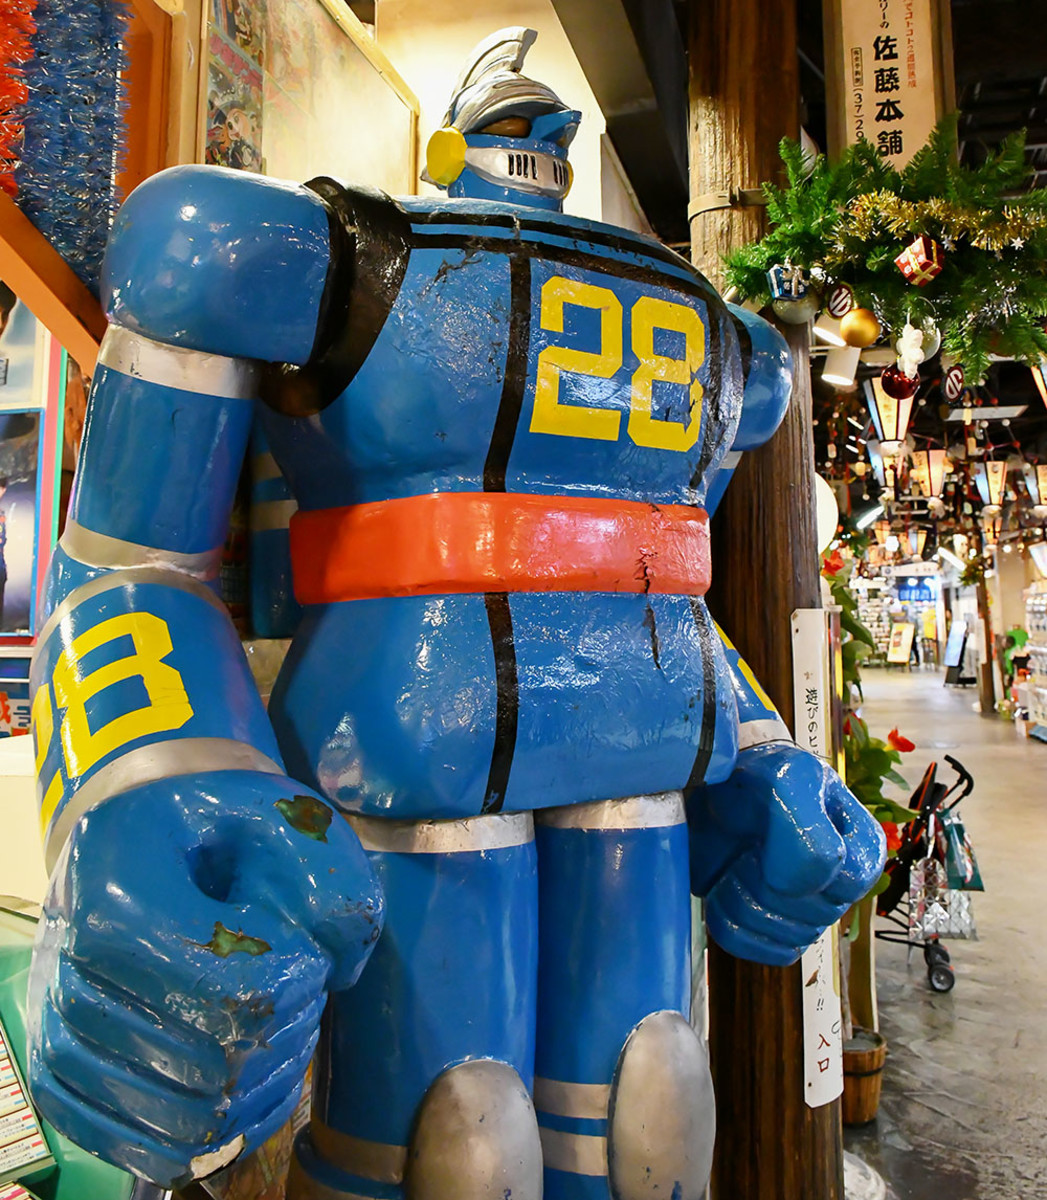 Mecha heroes watch over Japan's capital tirelessly.